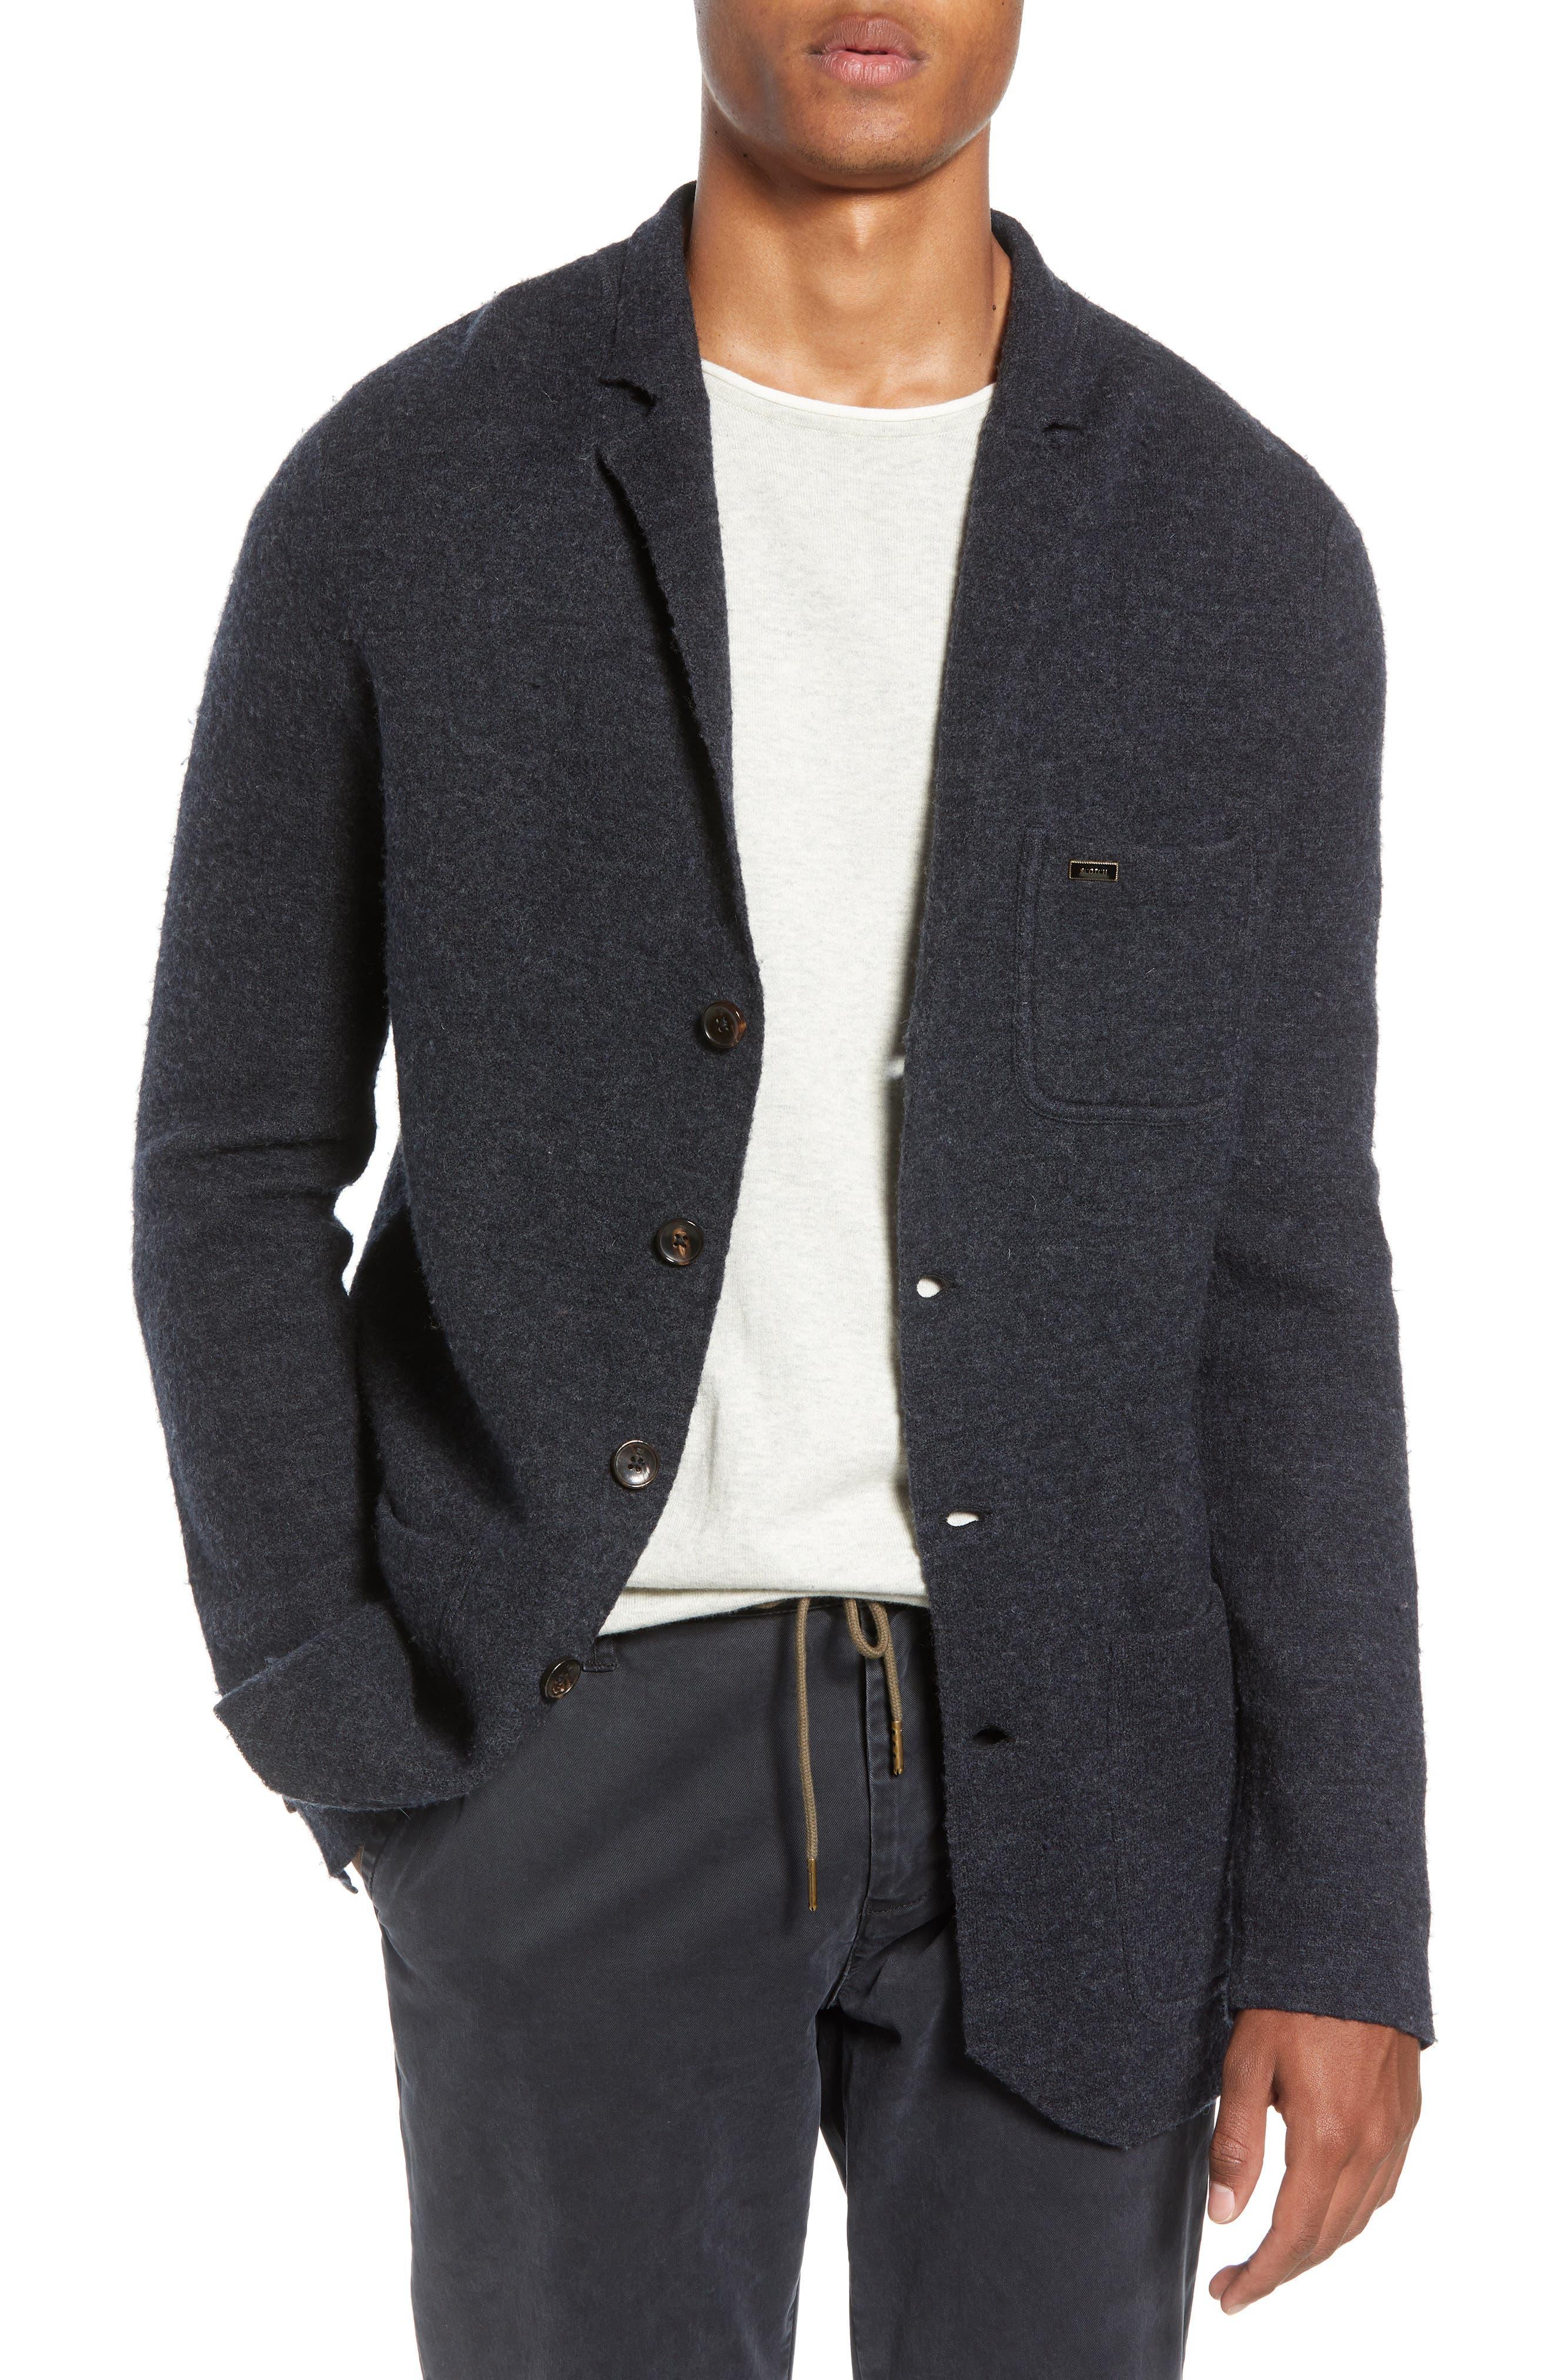 Boiled Wool Blazer,                             Main thumbnail 1, color,                             CHARCOAL MELANGE